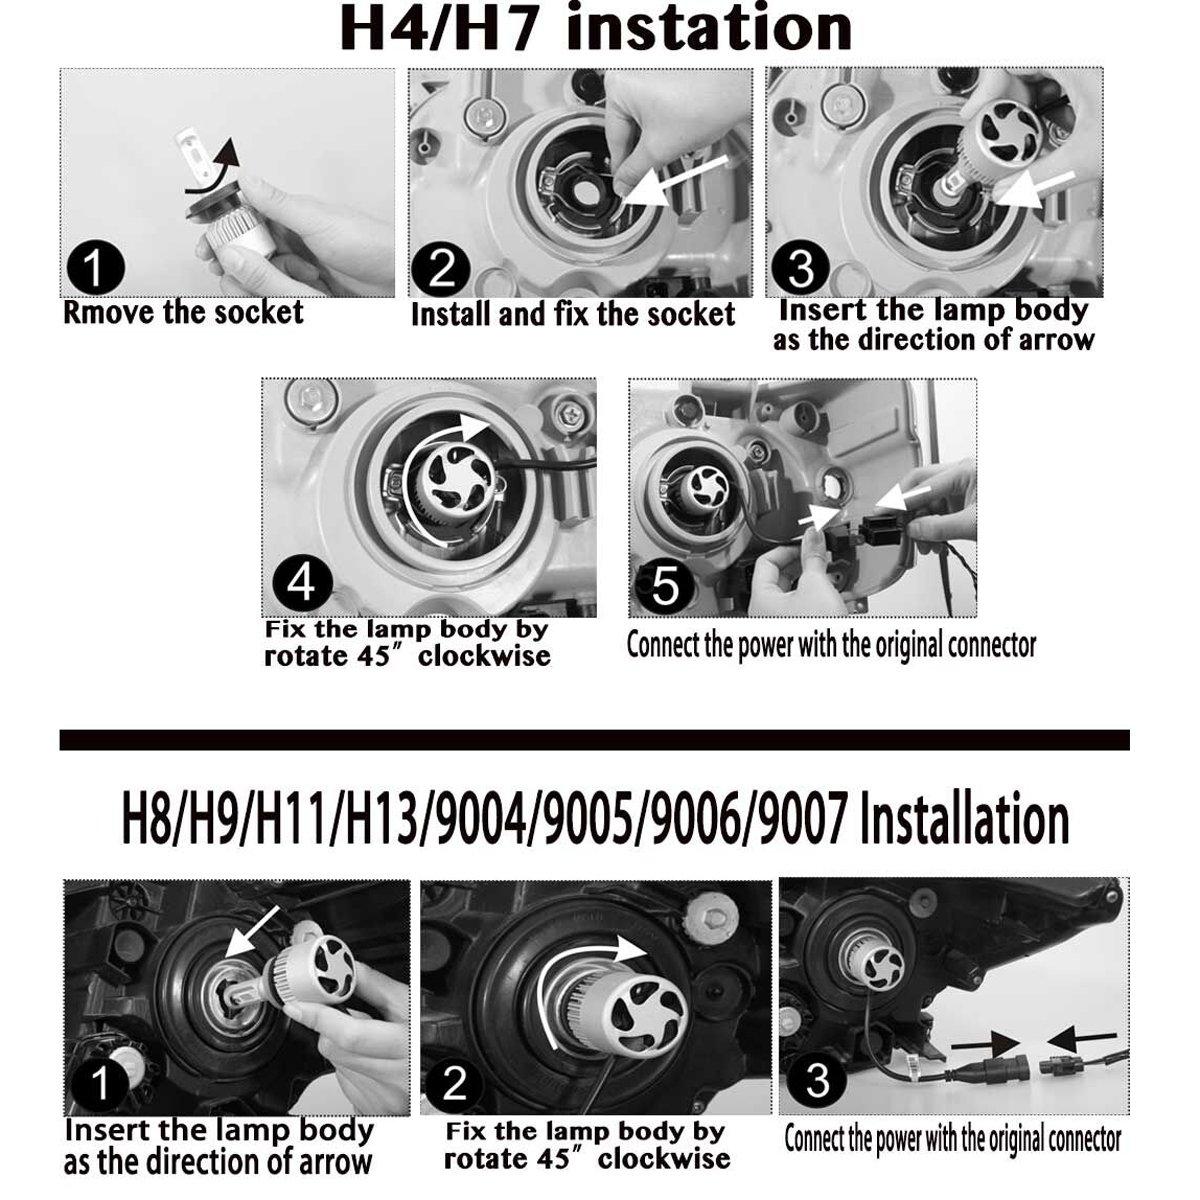 H11 H8 H9 Led Headlight Bulb Kit Super Bright 6000k 12k Kensun Hid Wiring Diagram White 7200lm High Low Beam Fog Light Bulbs Replacement Set Plug Play 2 Year Guarantee